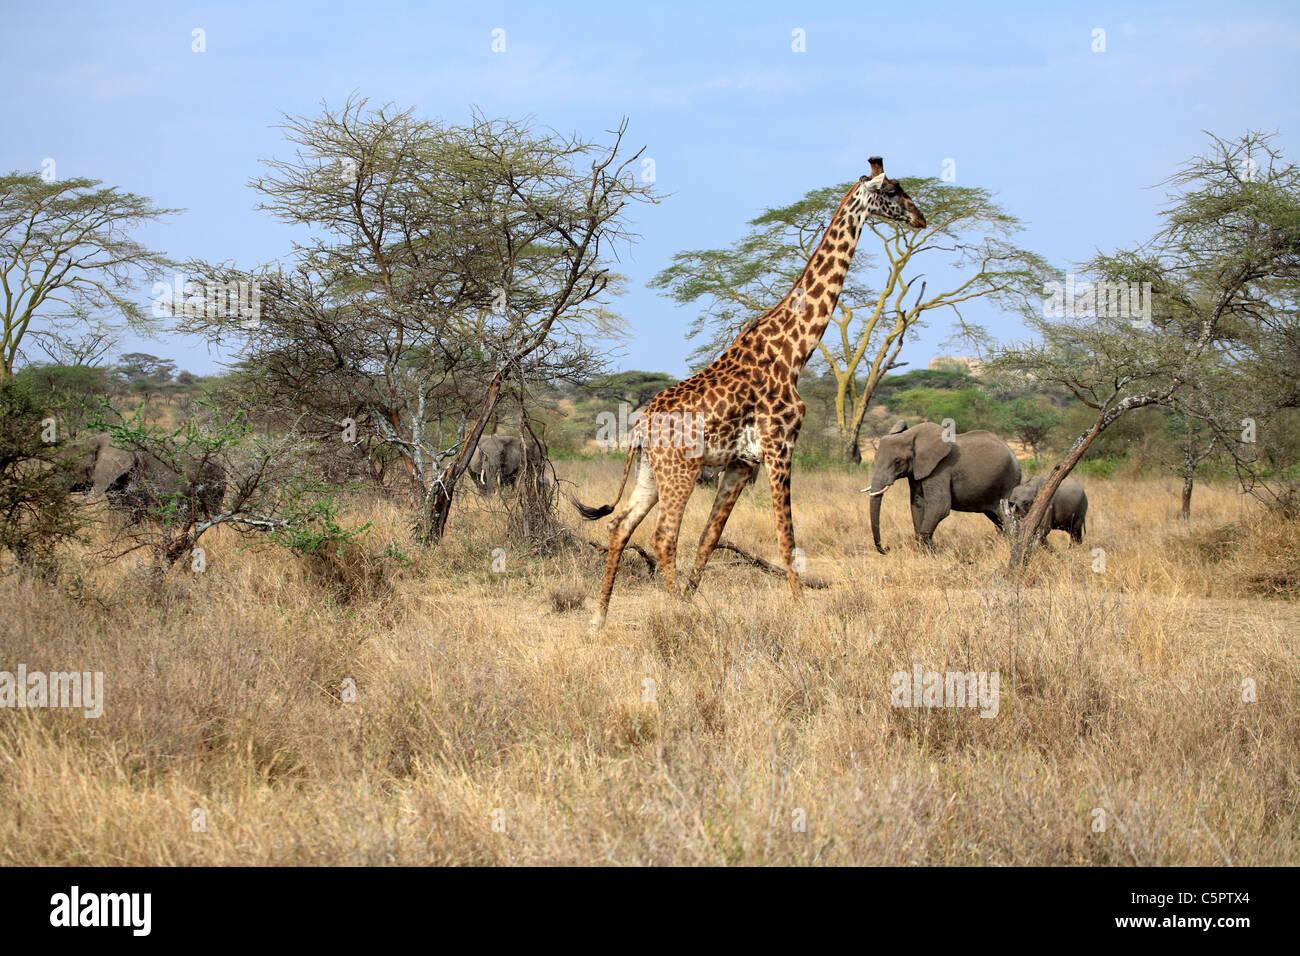 Serengeti National Park, Tanzania - Stock Image